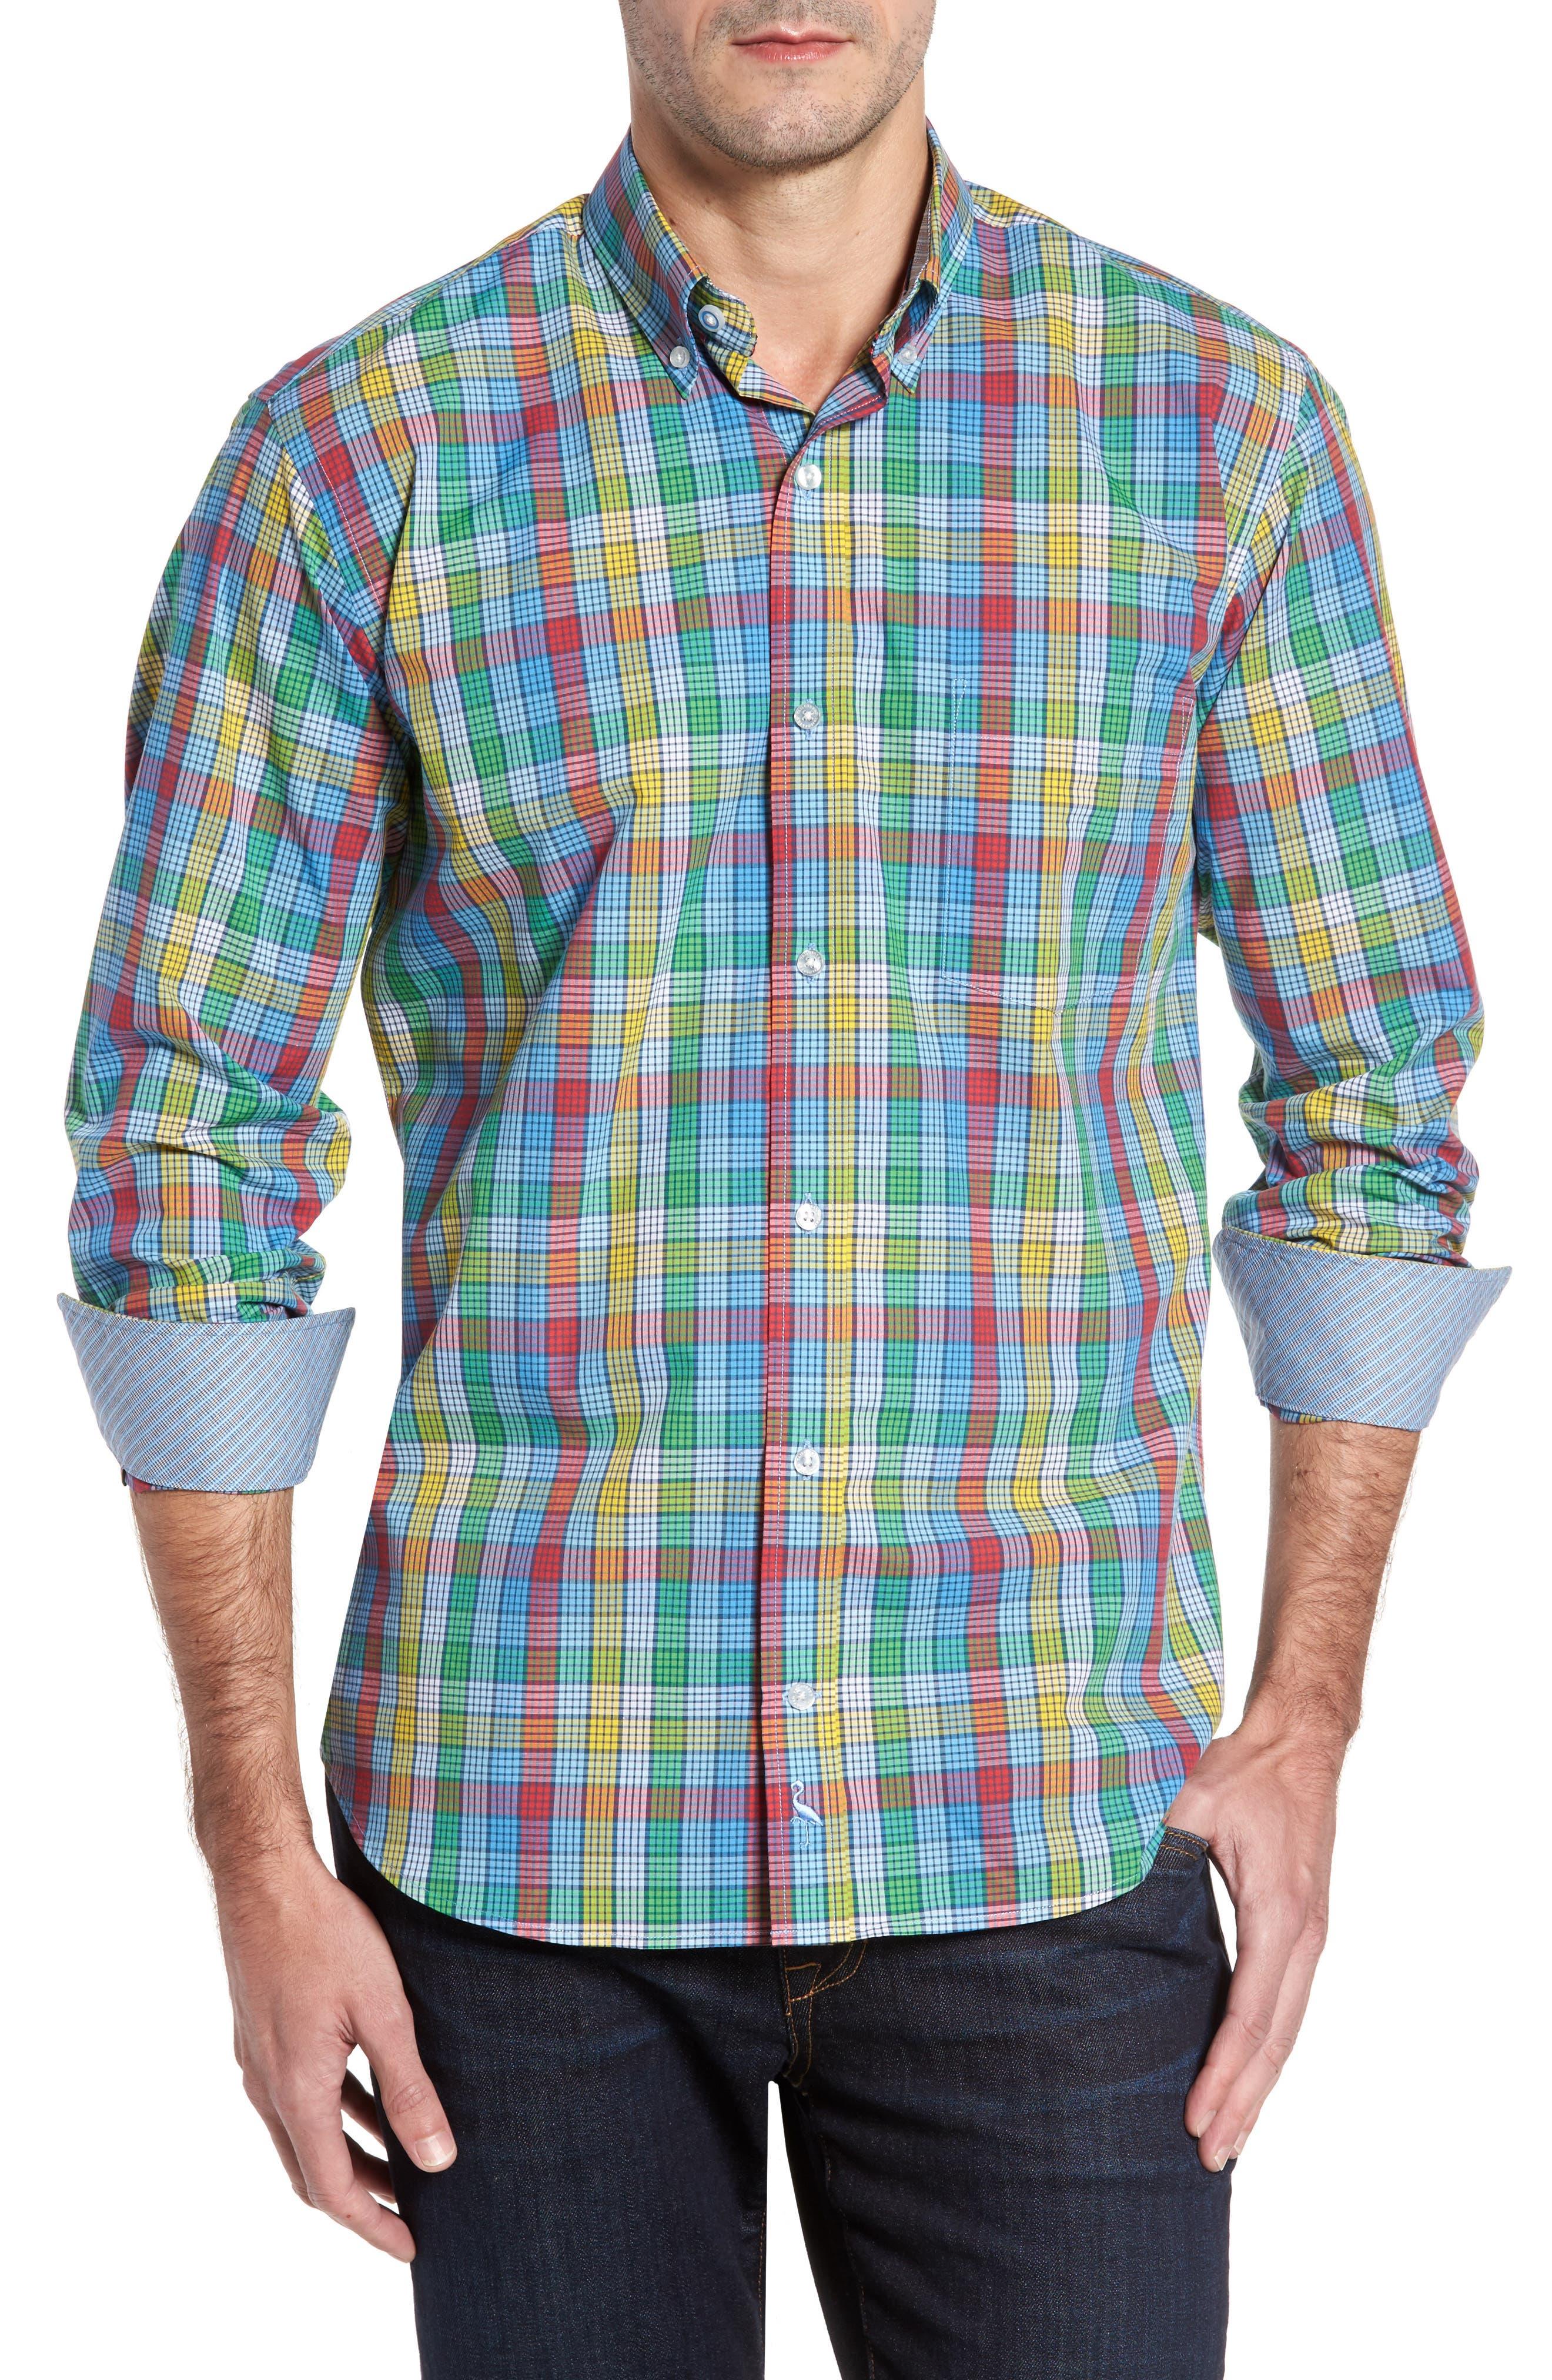 Main Image - TailorByrd Belmont Check Sport Shirt